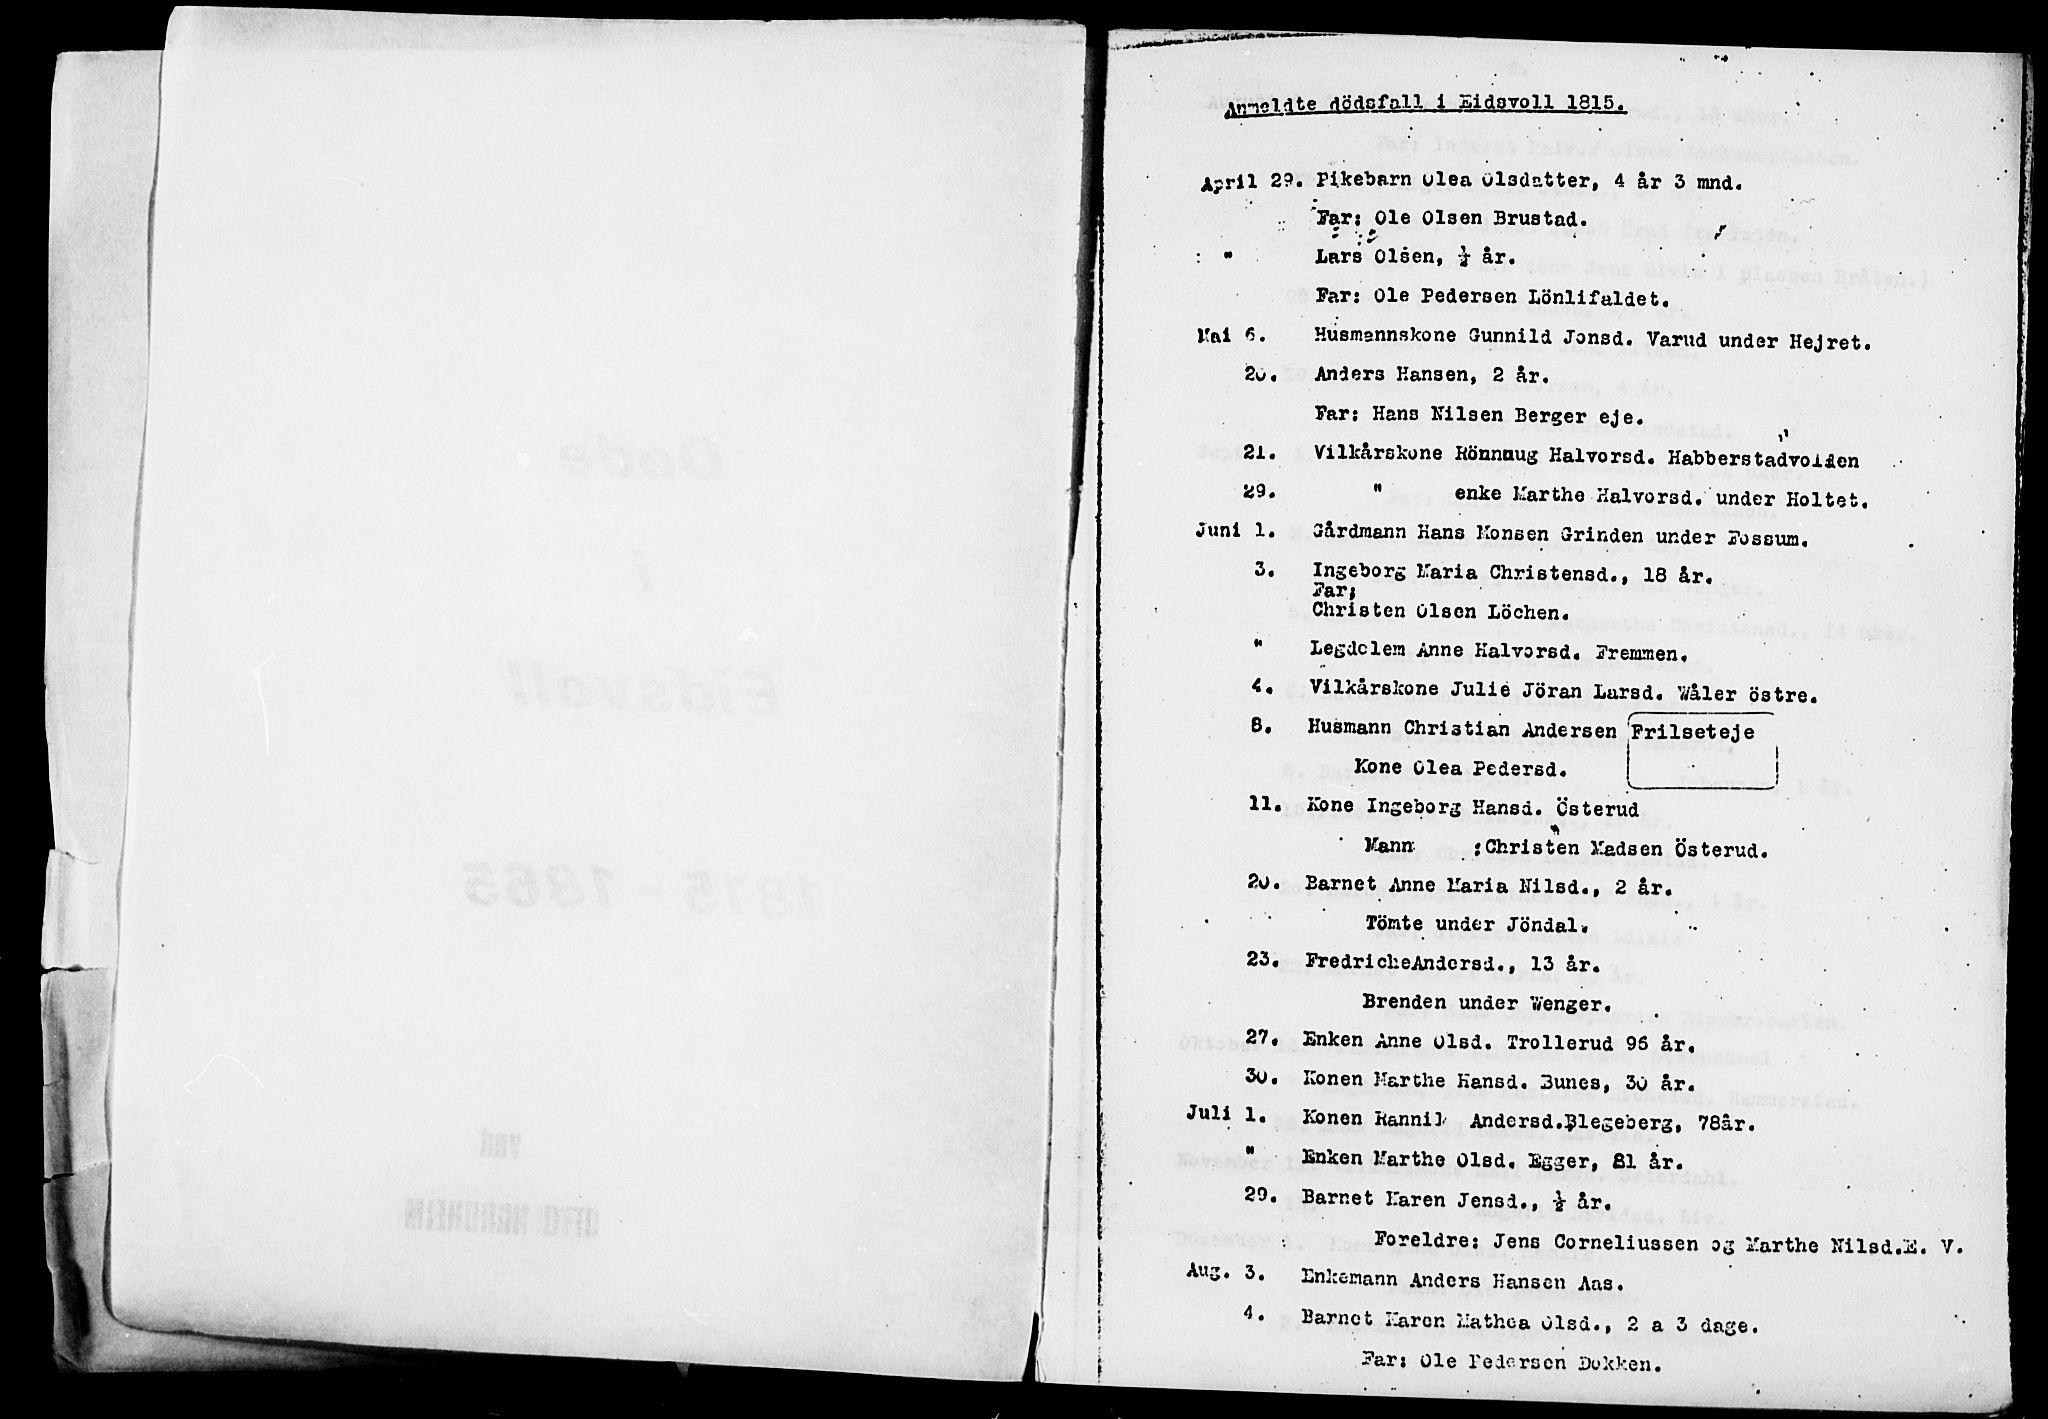 SAO, Eidsvoll prestekontor Kirkebøker, O/Oa/L0005: Annen kirkebok nr. 5, 1815-1865, s. 1